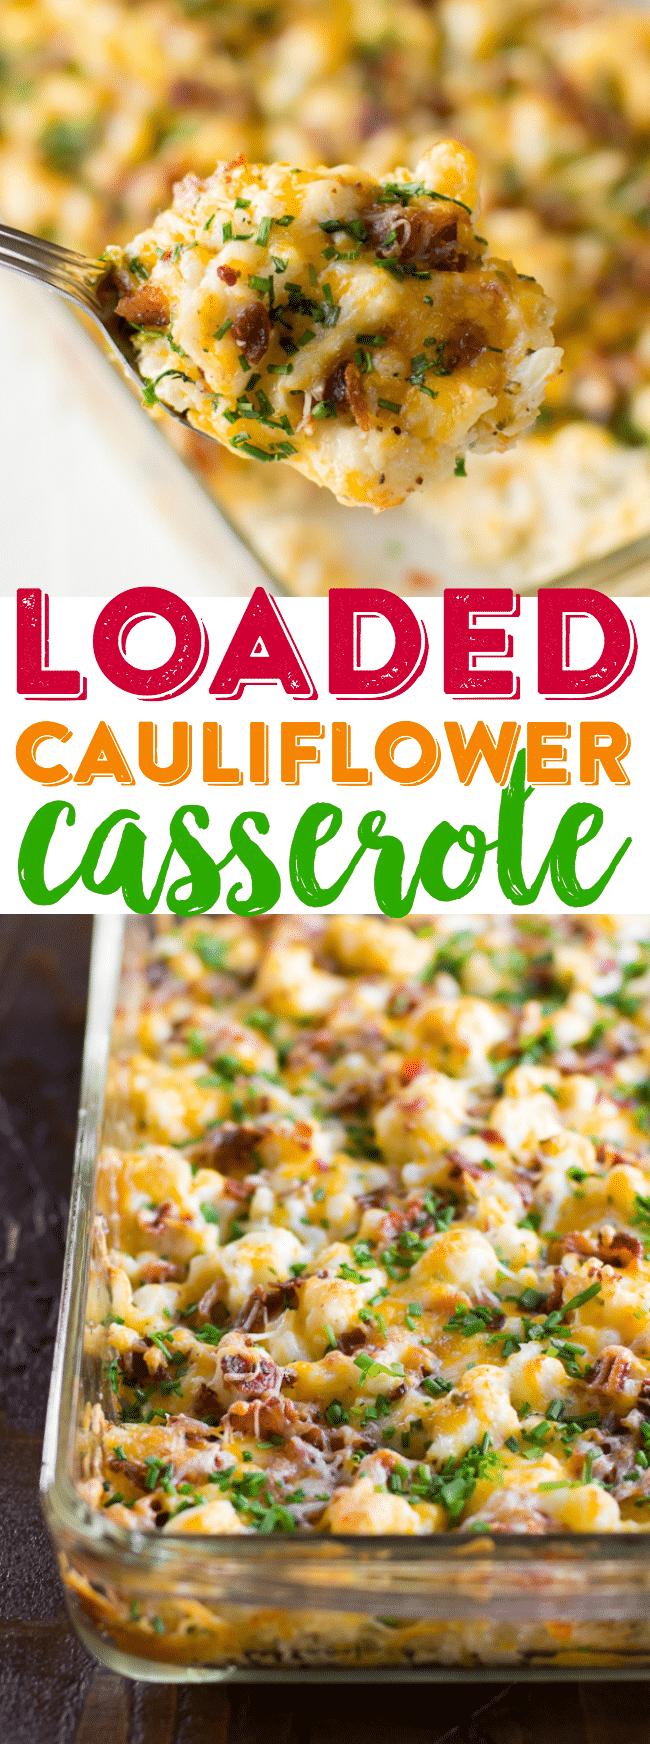 Keto Low Carb Loaded Cauliflower Casserole Recipe | Cheesy Cauliflower Casserole | Baked Cauliflower Dinner | Easy Cauliflower Casserole #Keto #LowCarb